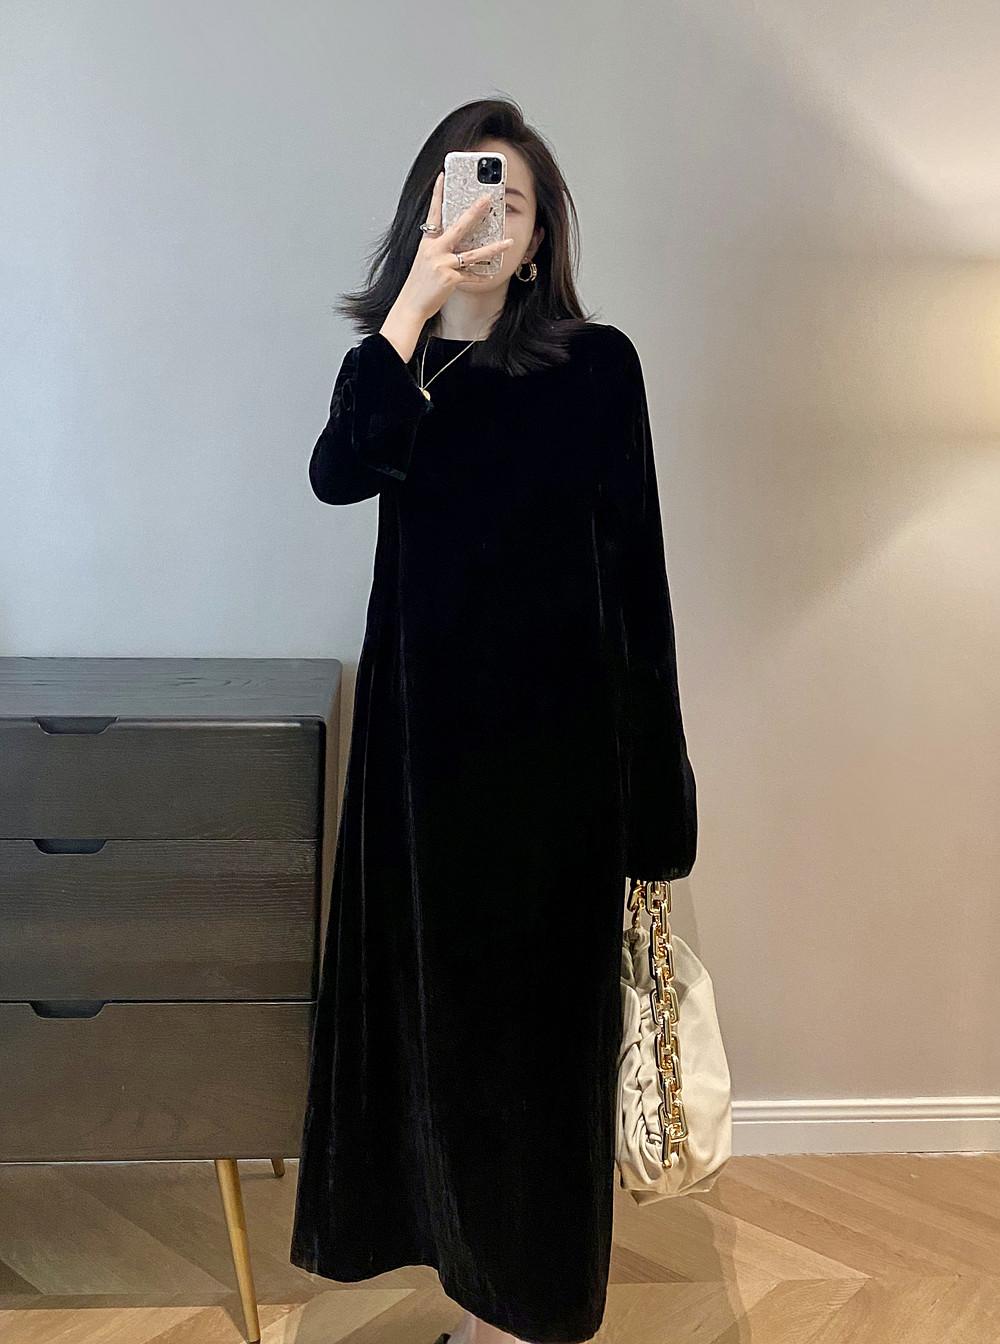 LUV BLANC重磅高ji感 进口真丝丝绒鱼尾袖 宽松显瘦显瘦连衣裙女